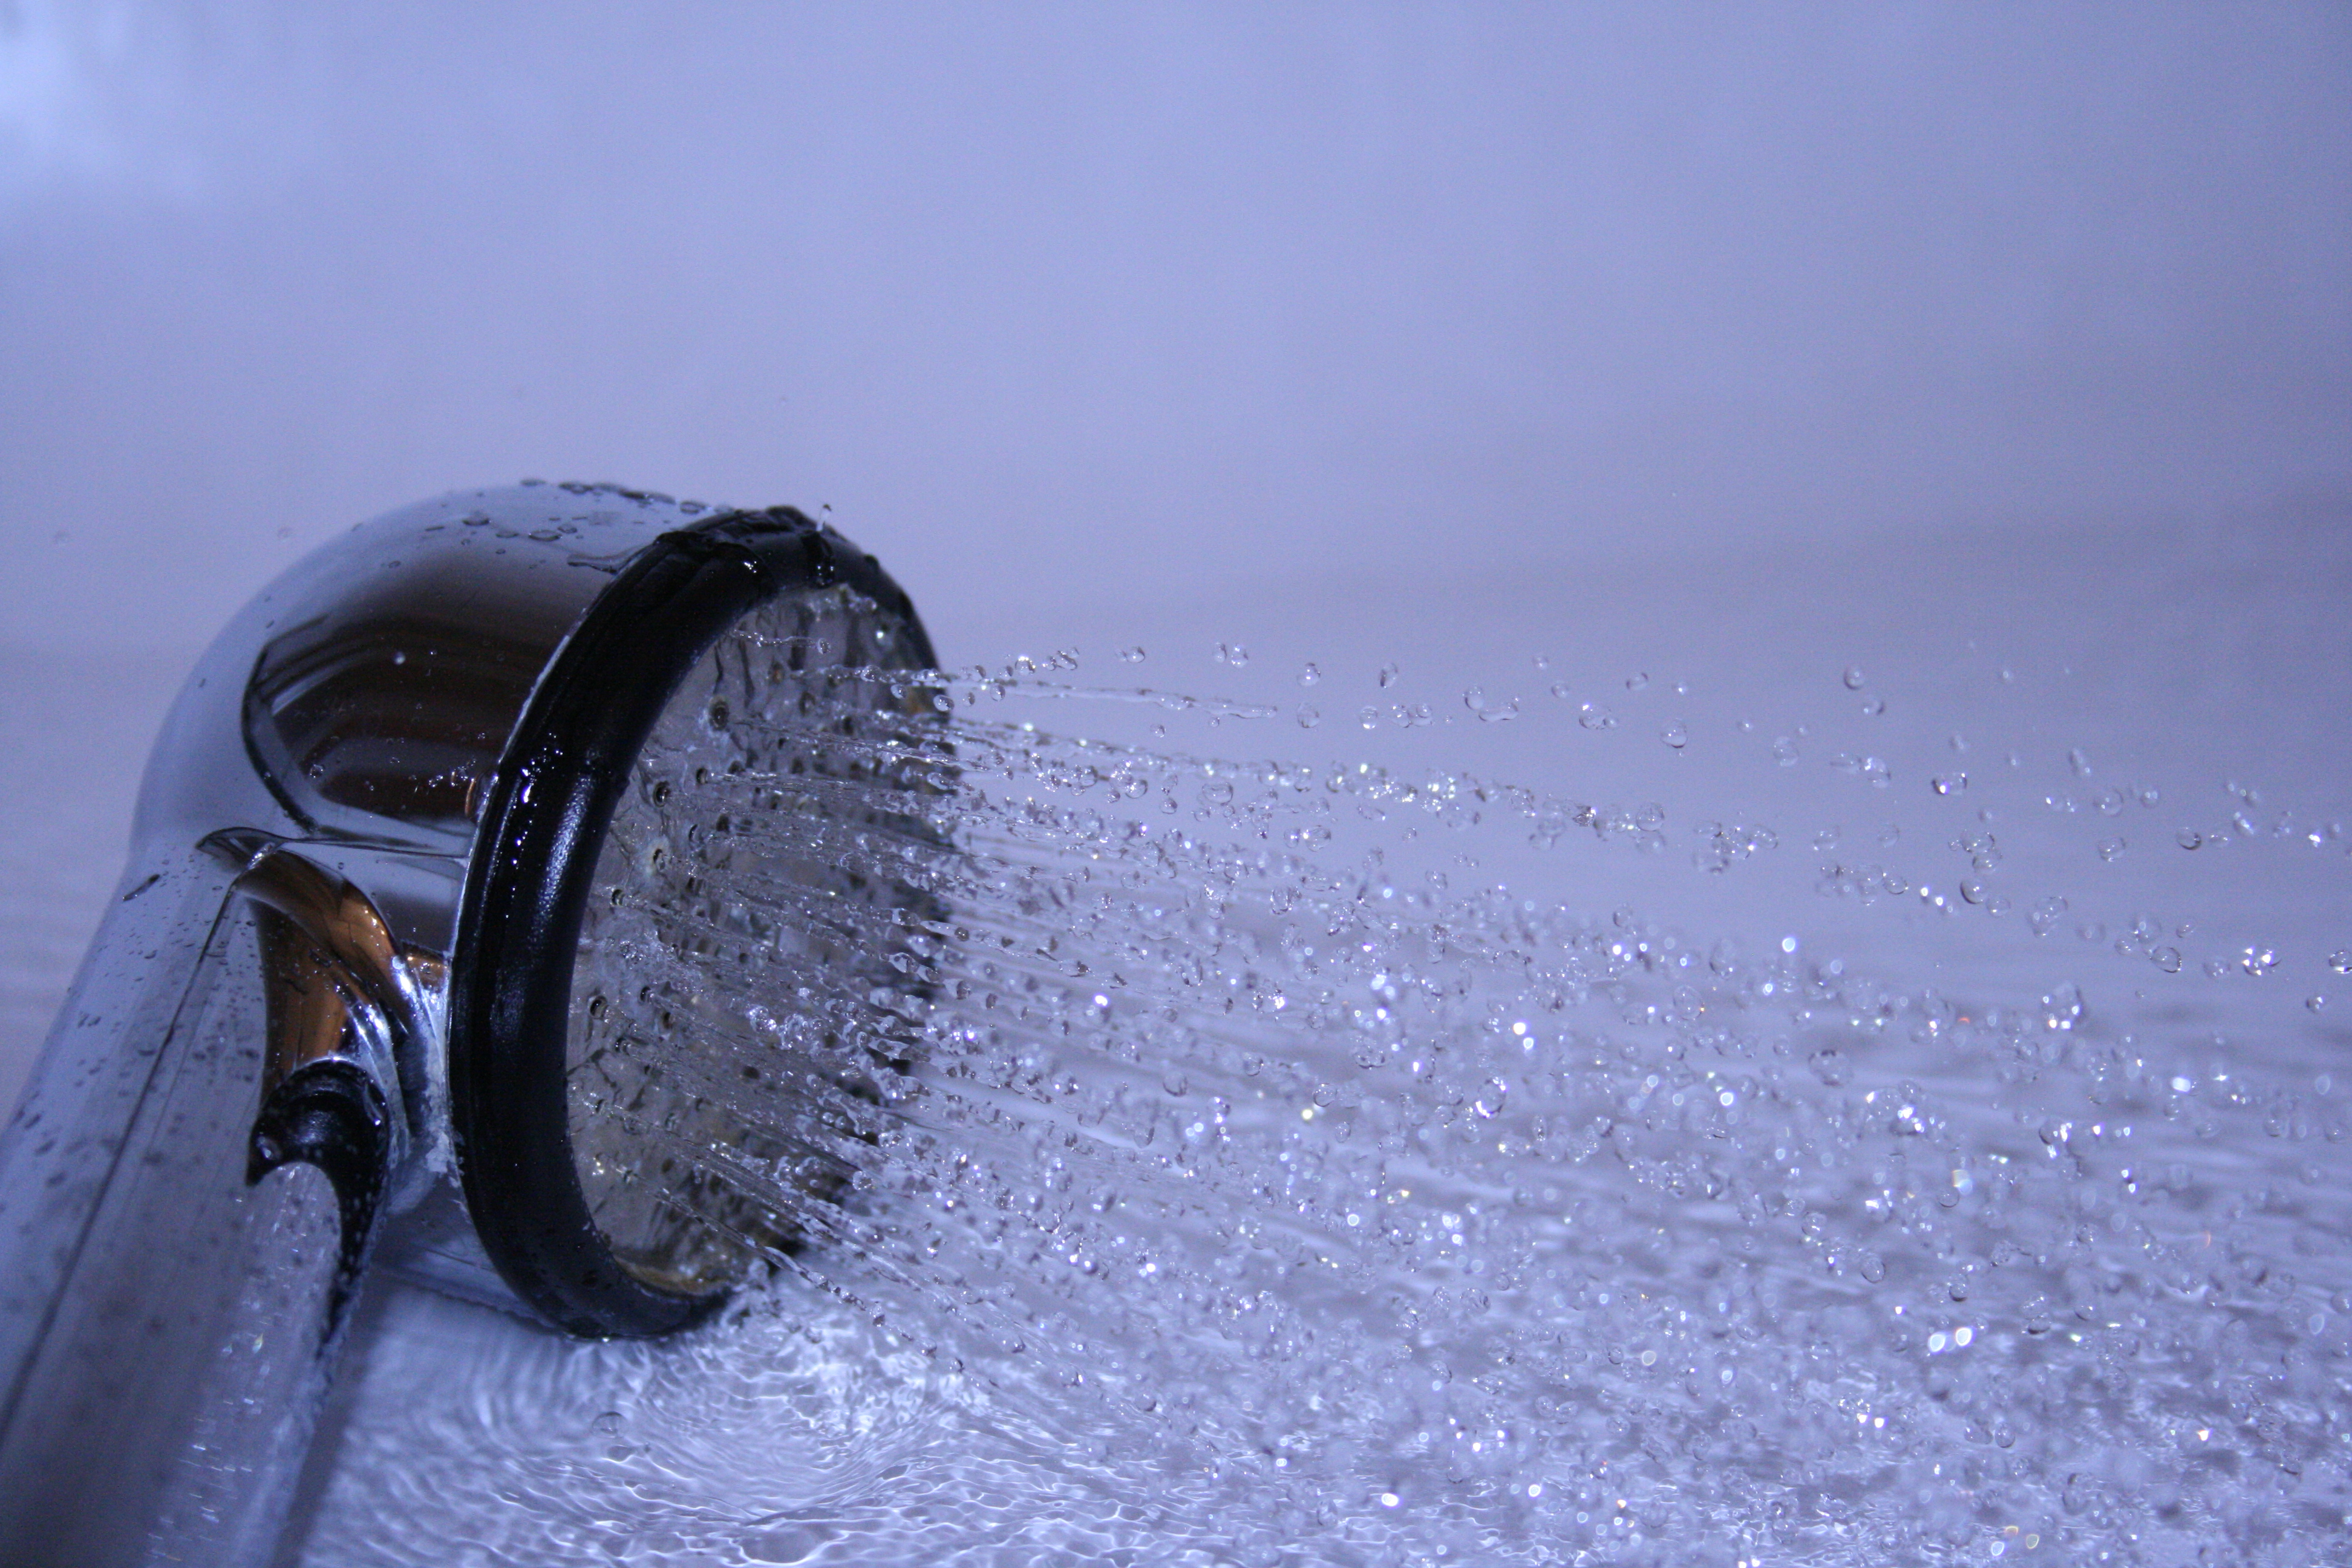 DIY Hard Water Shower Softener For Under $5 - Pantry Spa